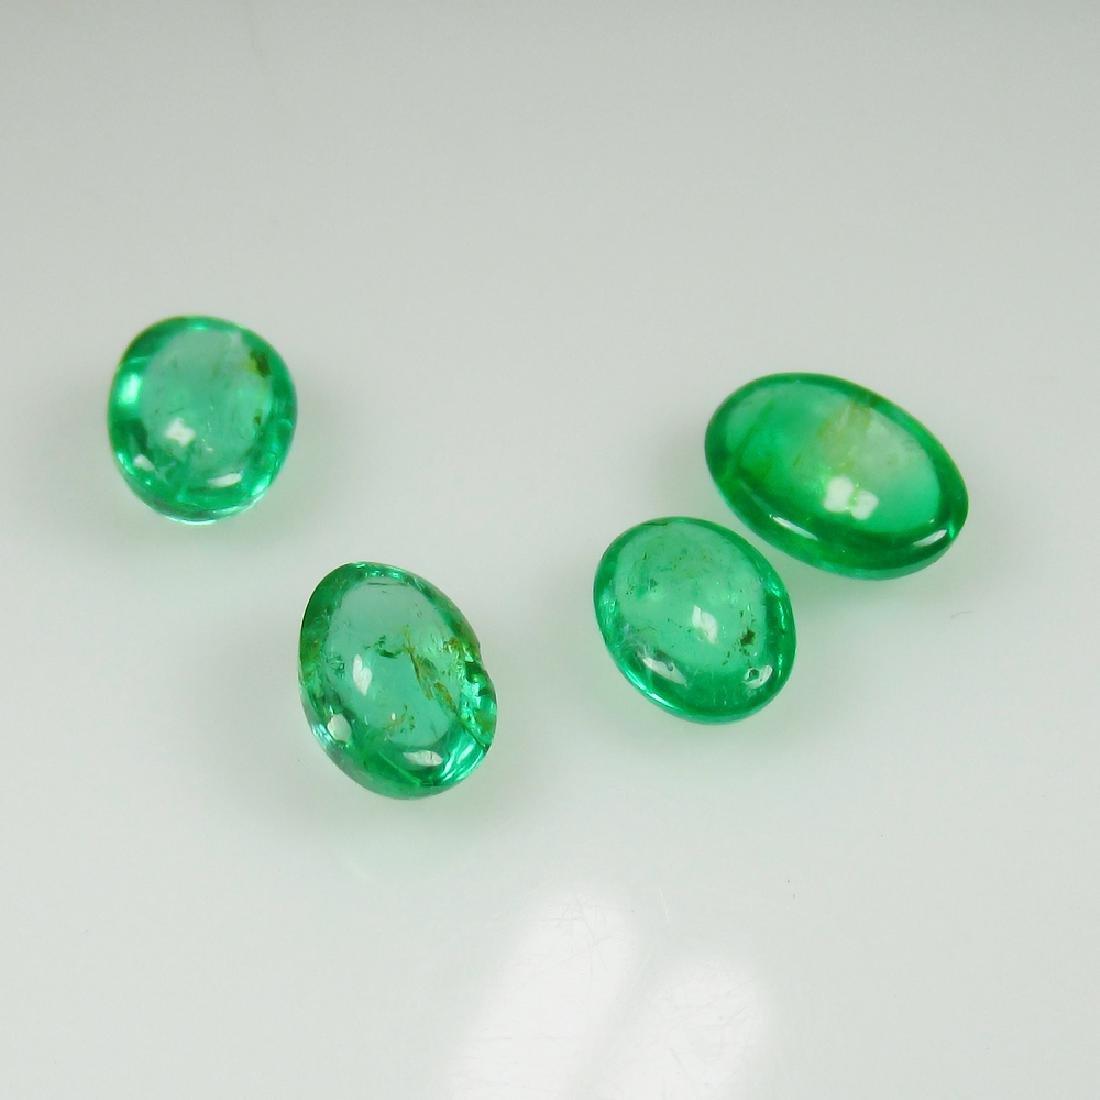 3.57 Ct Genuine 4 Loose Zambian Emerald Nice Oval